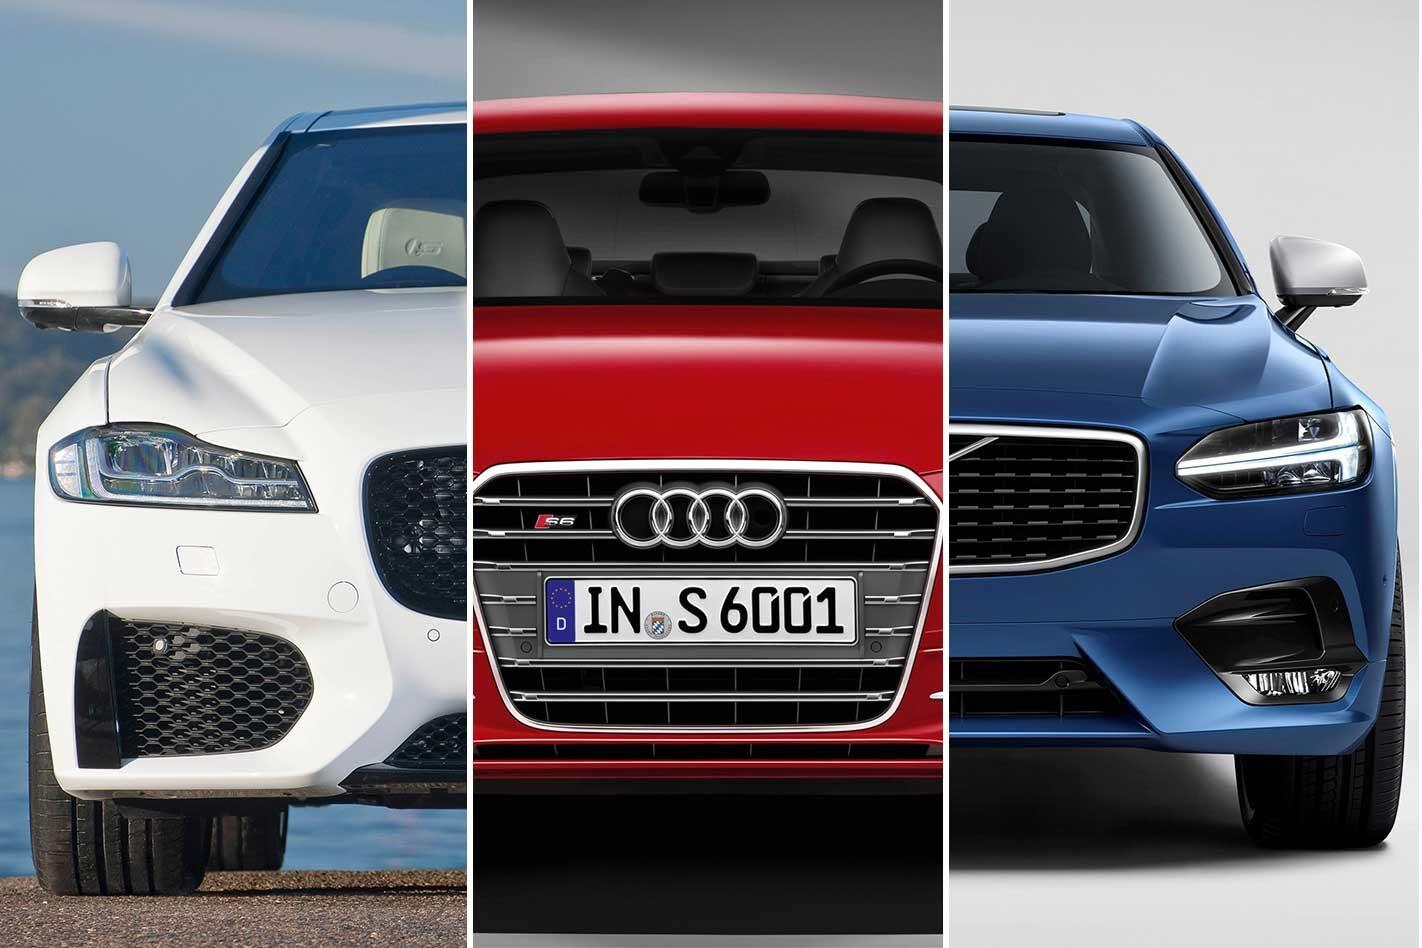 Euro sports sedan bargains